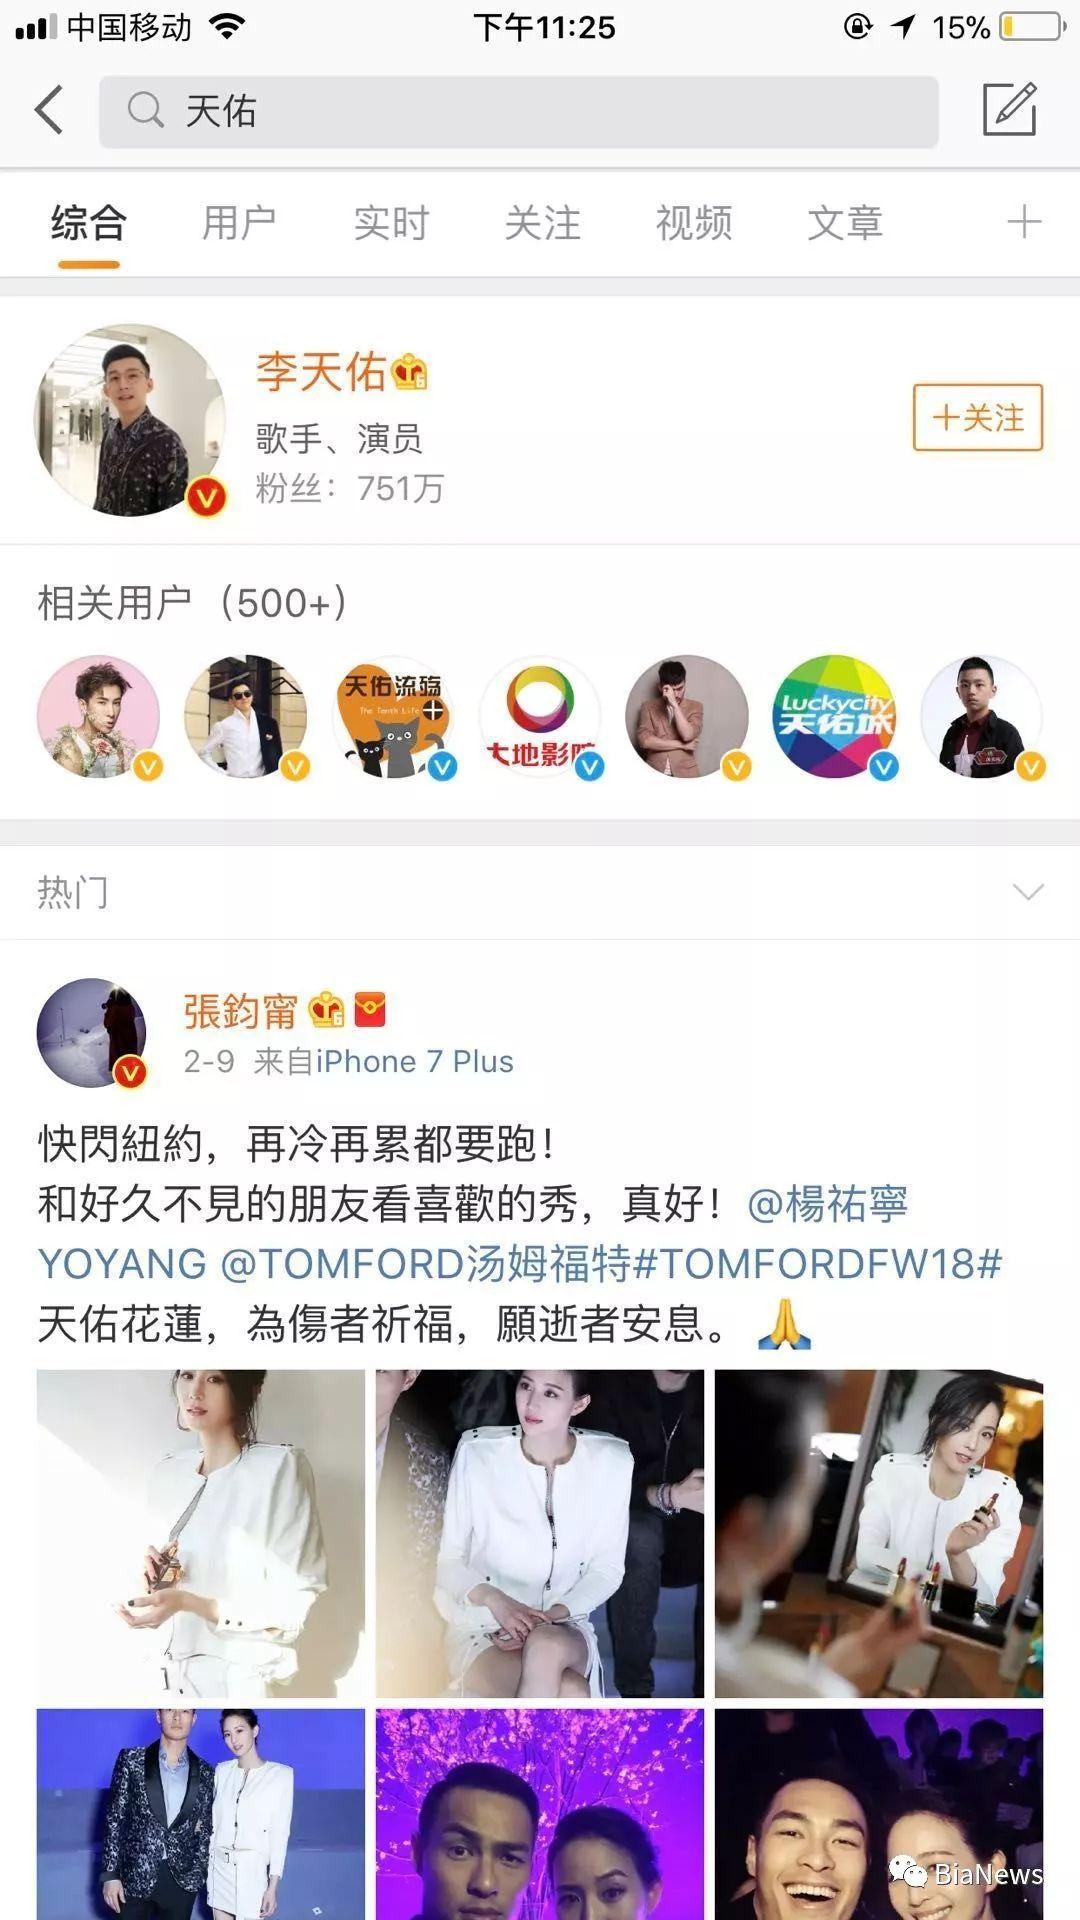 MC天佑被禁播 网友:公众人物就该宣扬正确的道德价值观